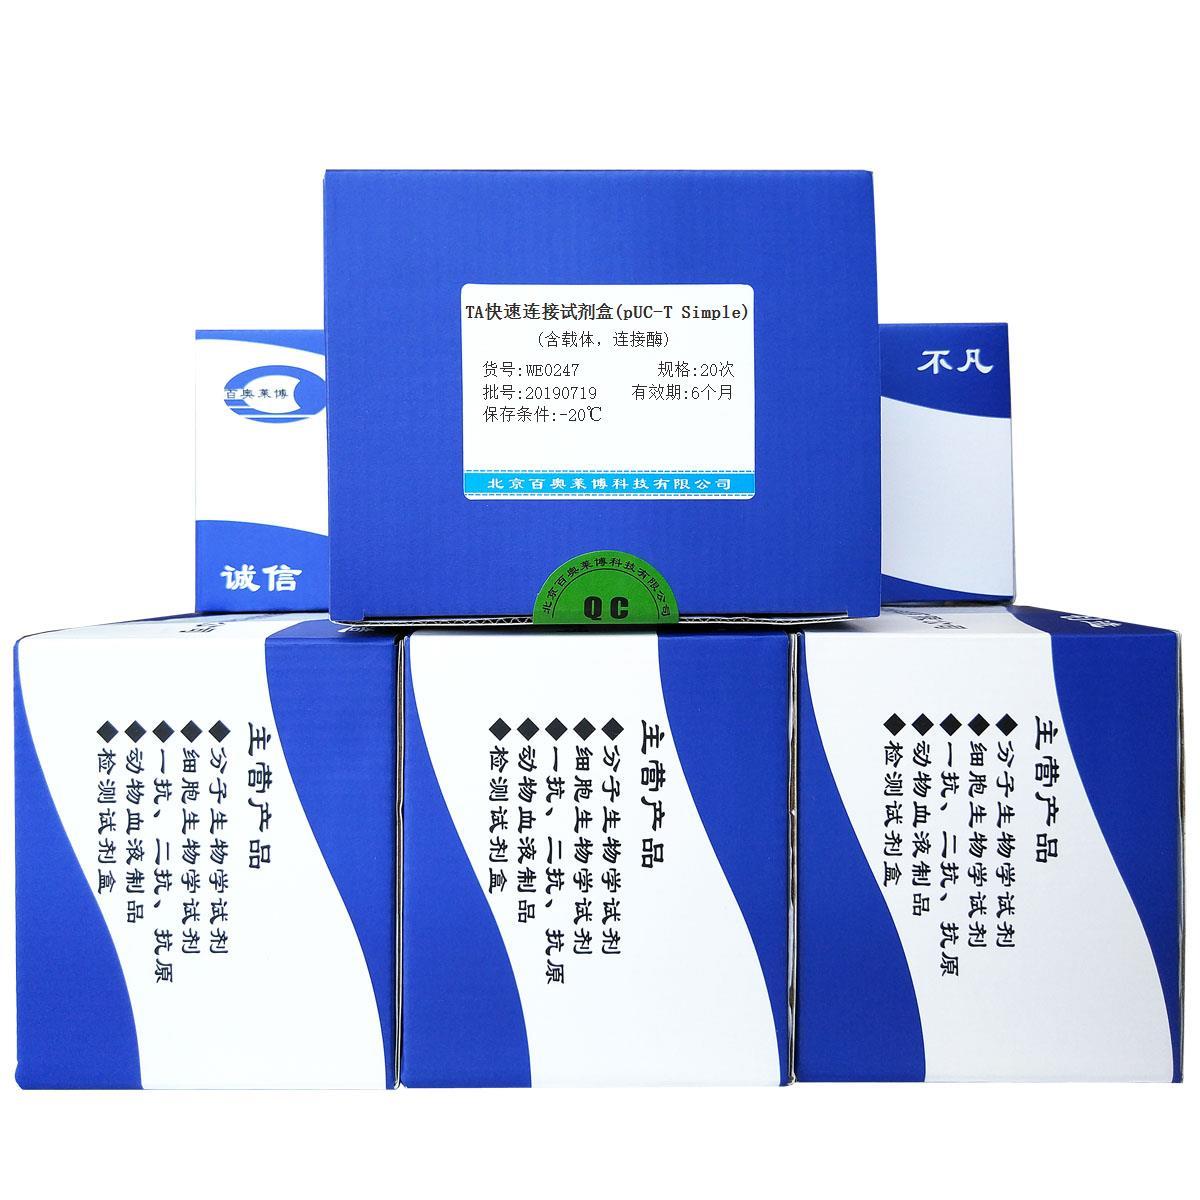 TA快速连接试剂盒(pUC-T Simple)(含载体,连接酶)